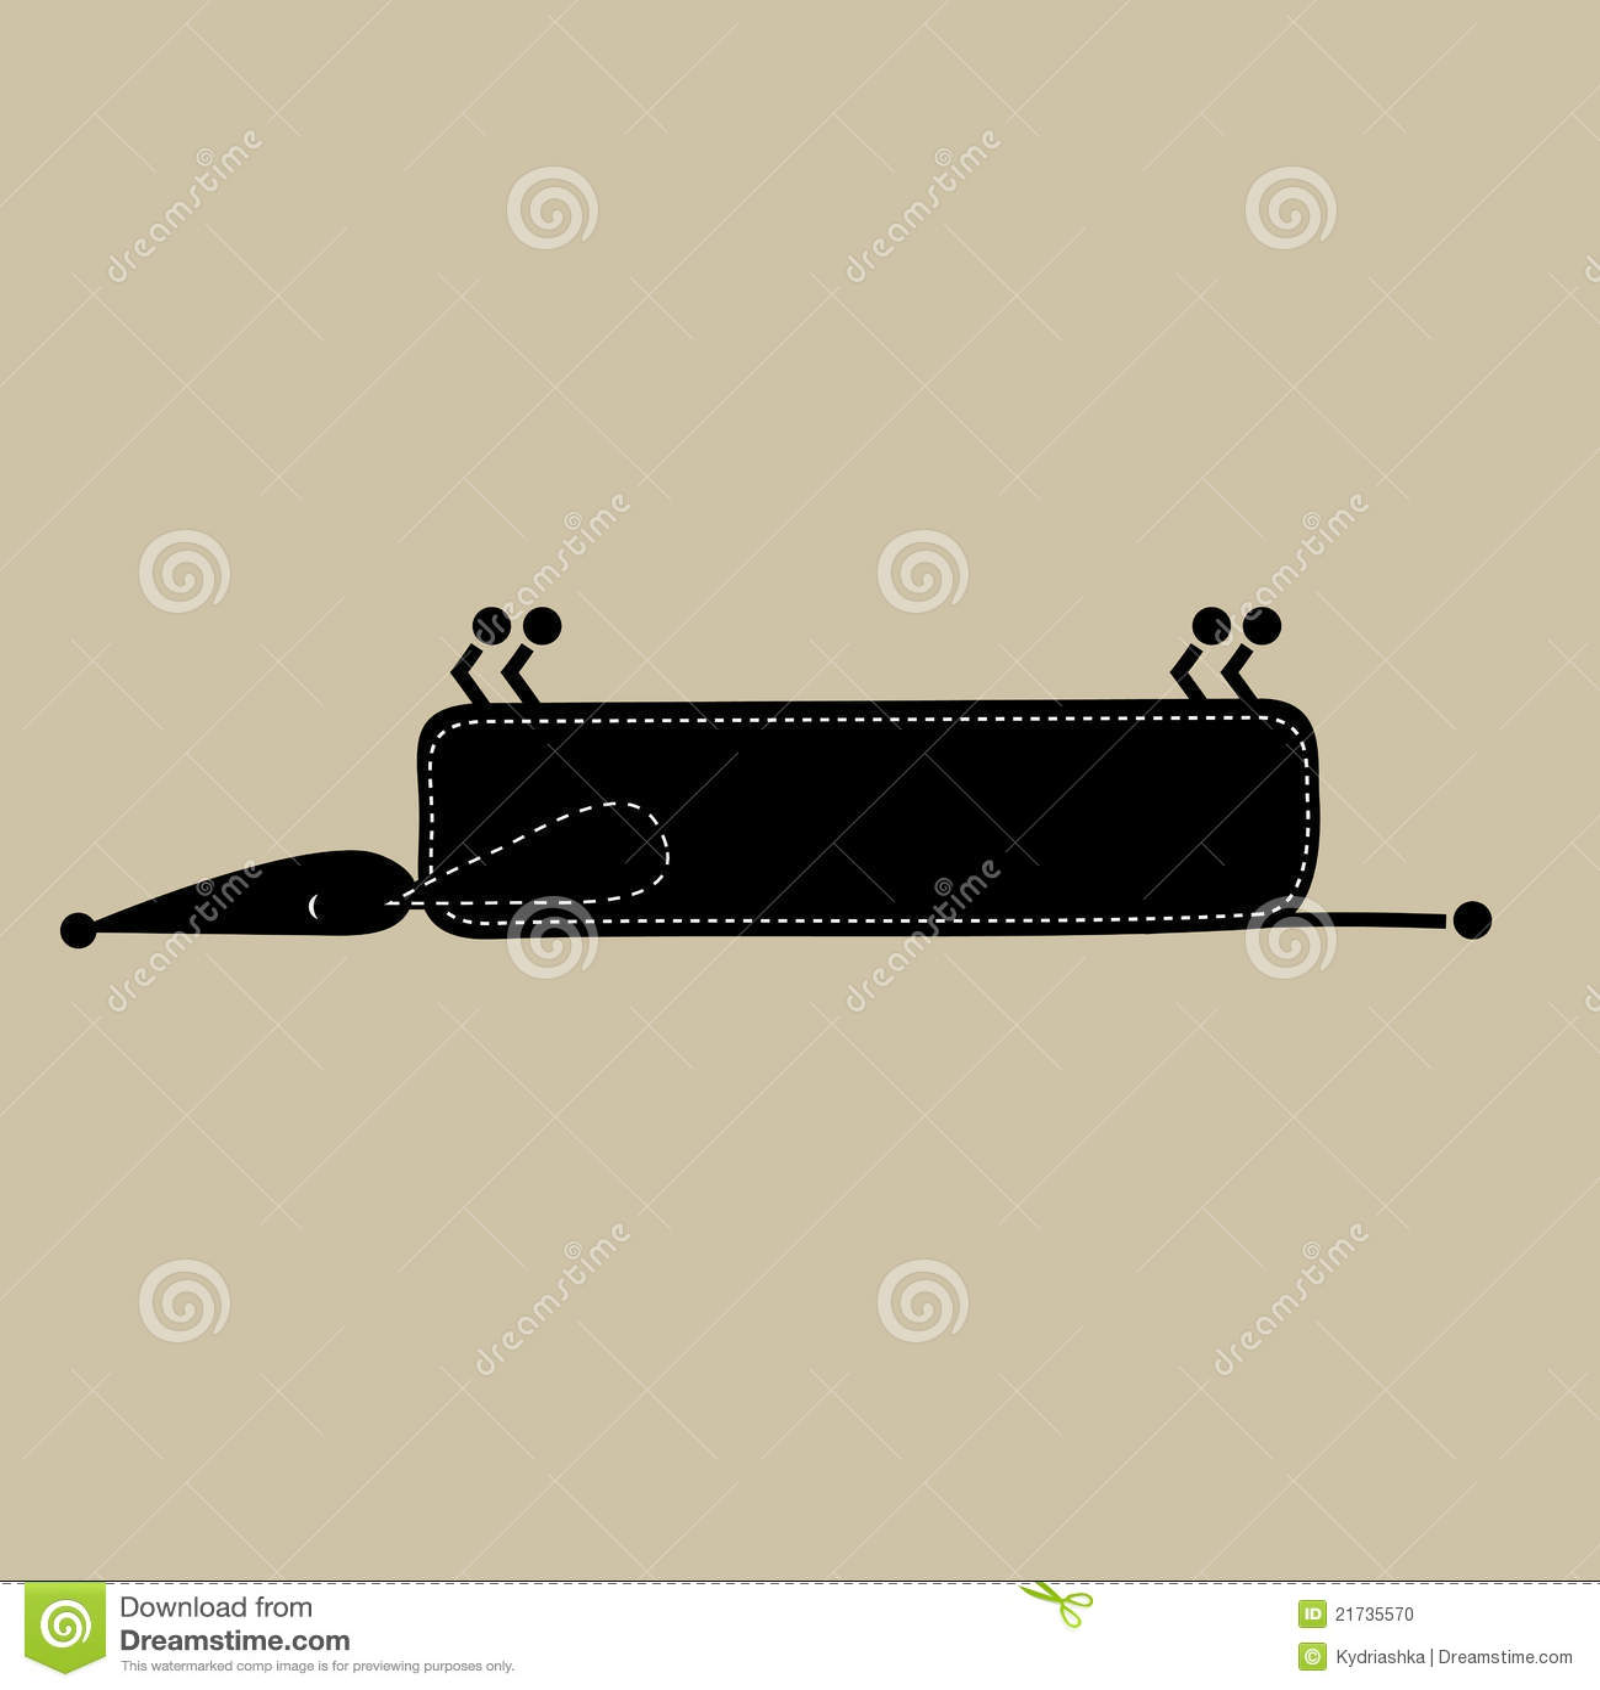 funny black dog silhouette for your design vector Outline Sofa Oslo Sofa